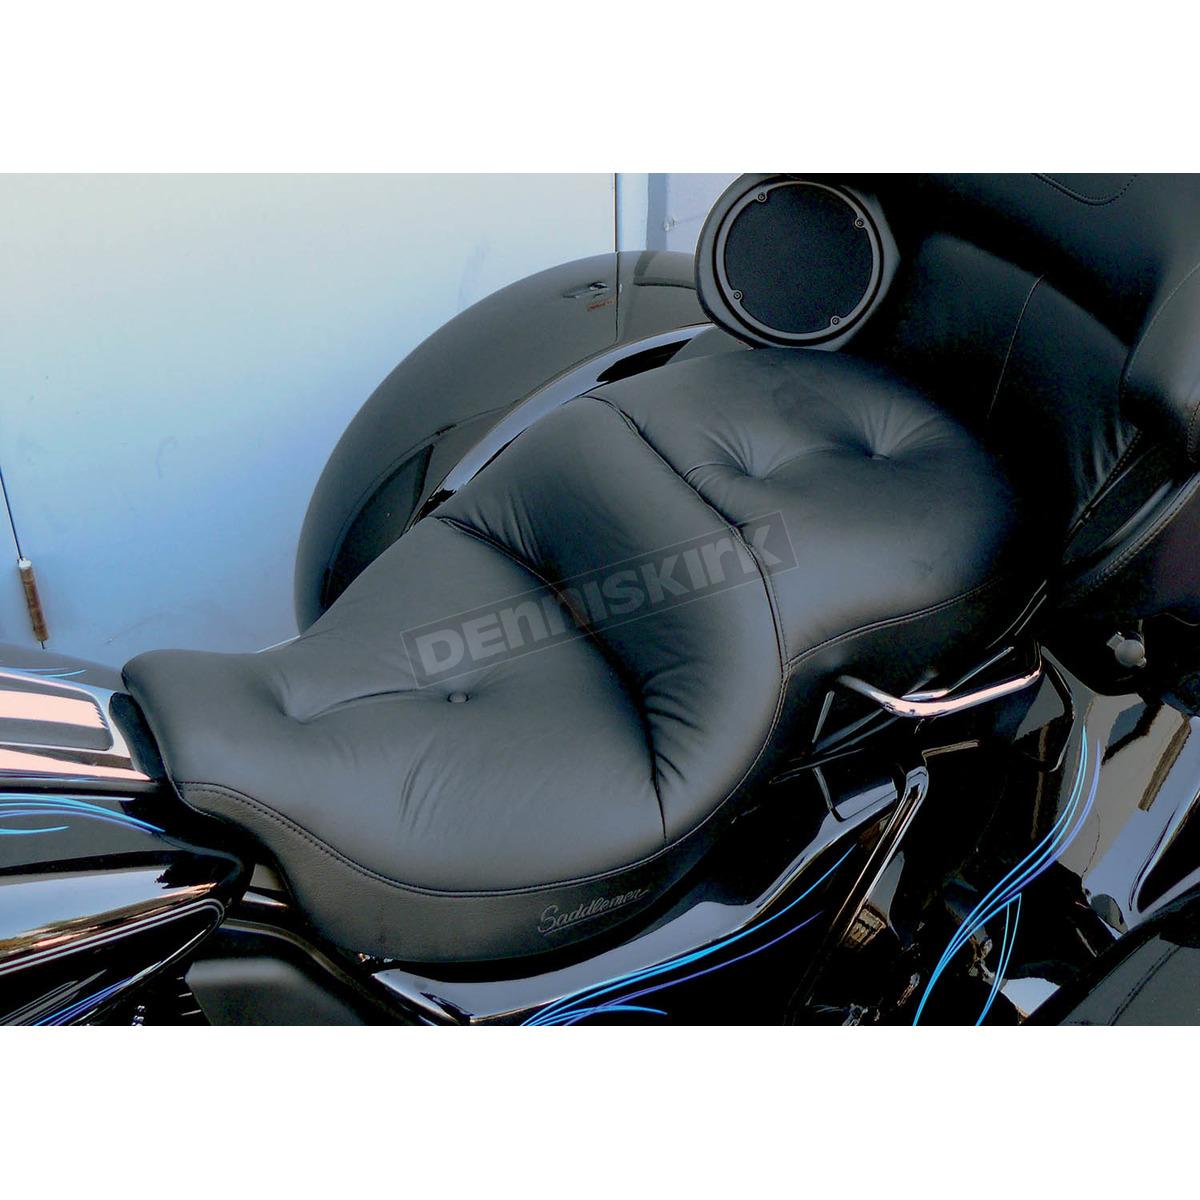 road sofa harley thomasville slipcovers saddlemen seat 808 021 084 davidson